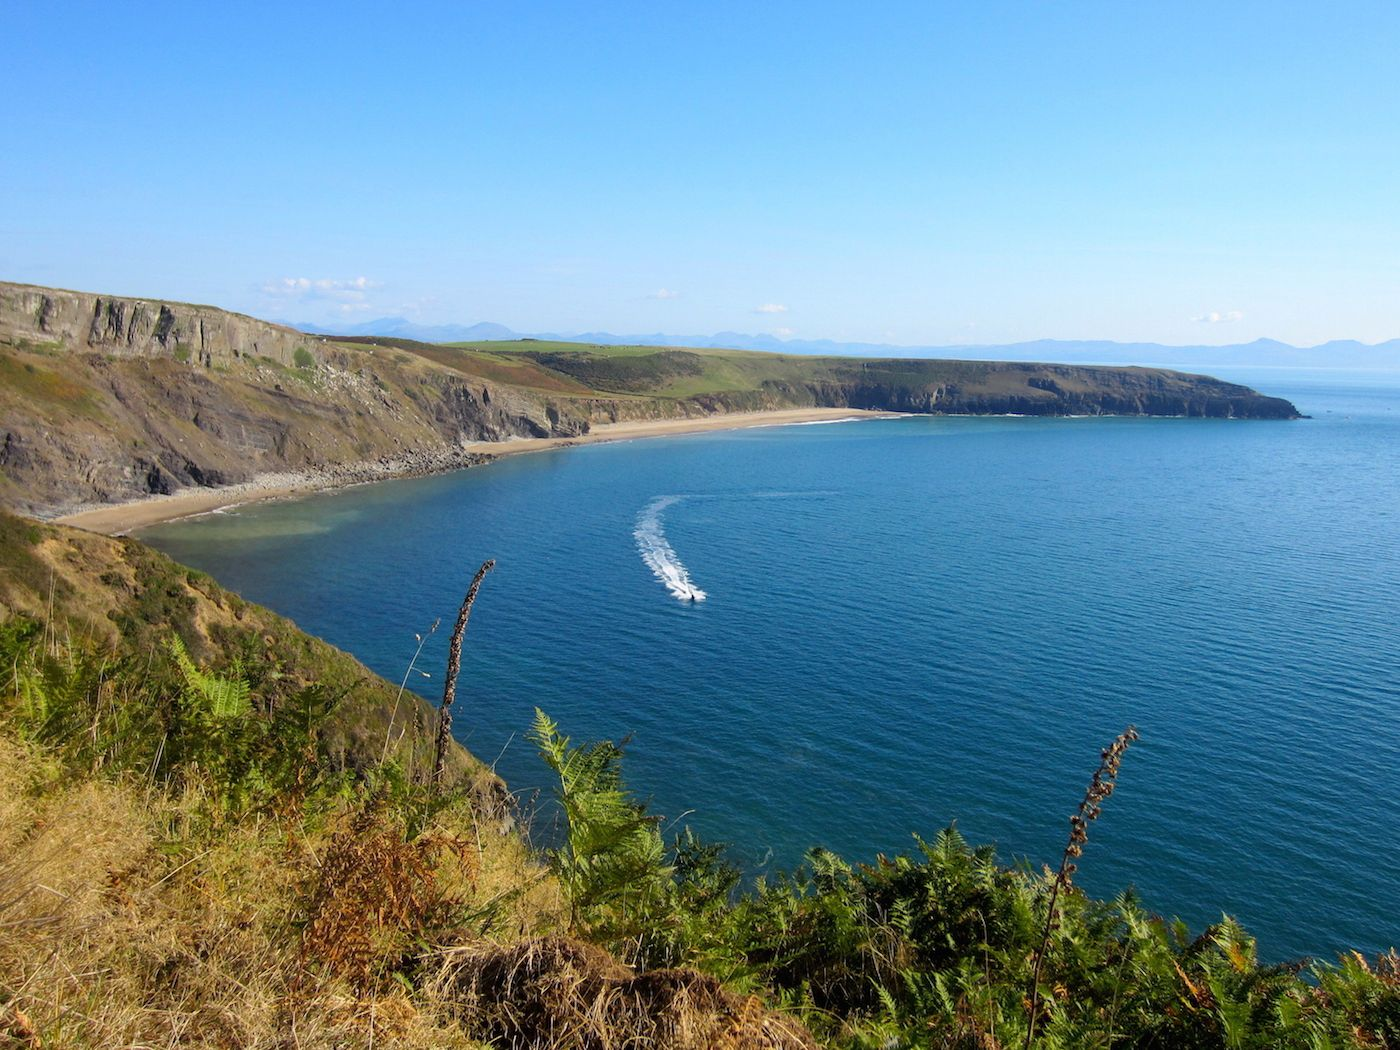 Seaside Campsites in Wales | The Best Coastal Campsites in Wales